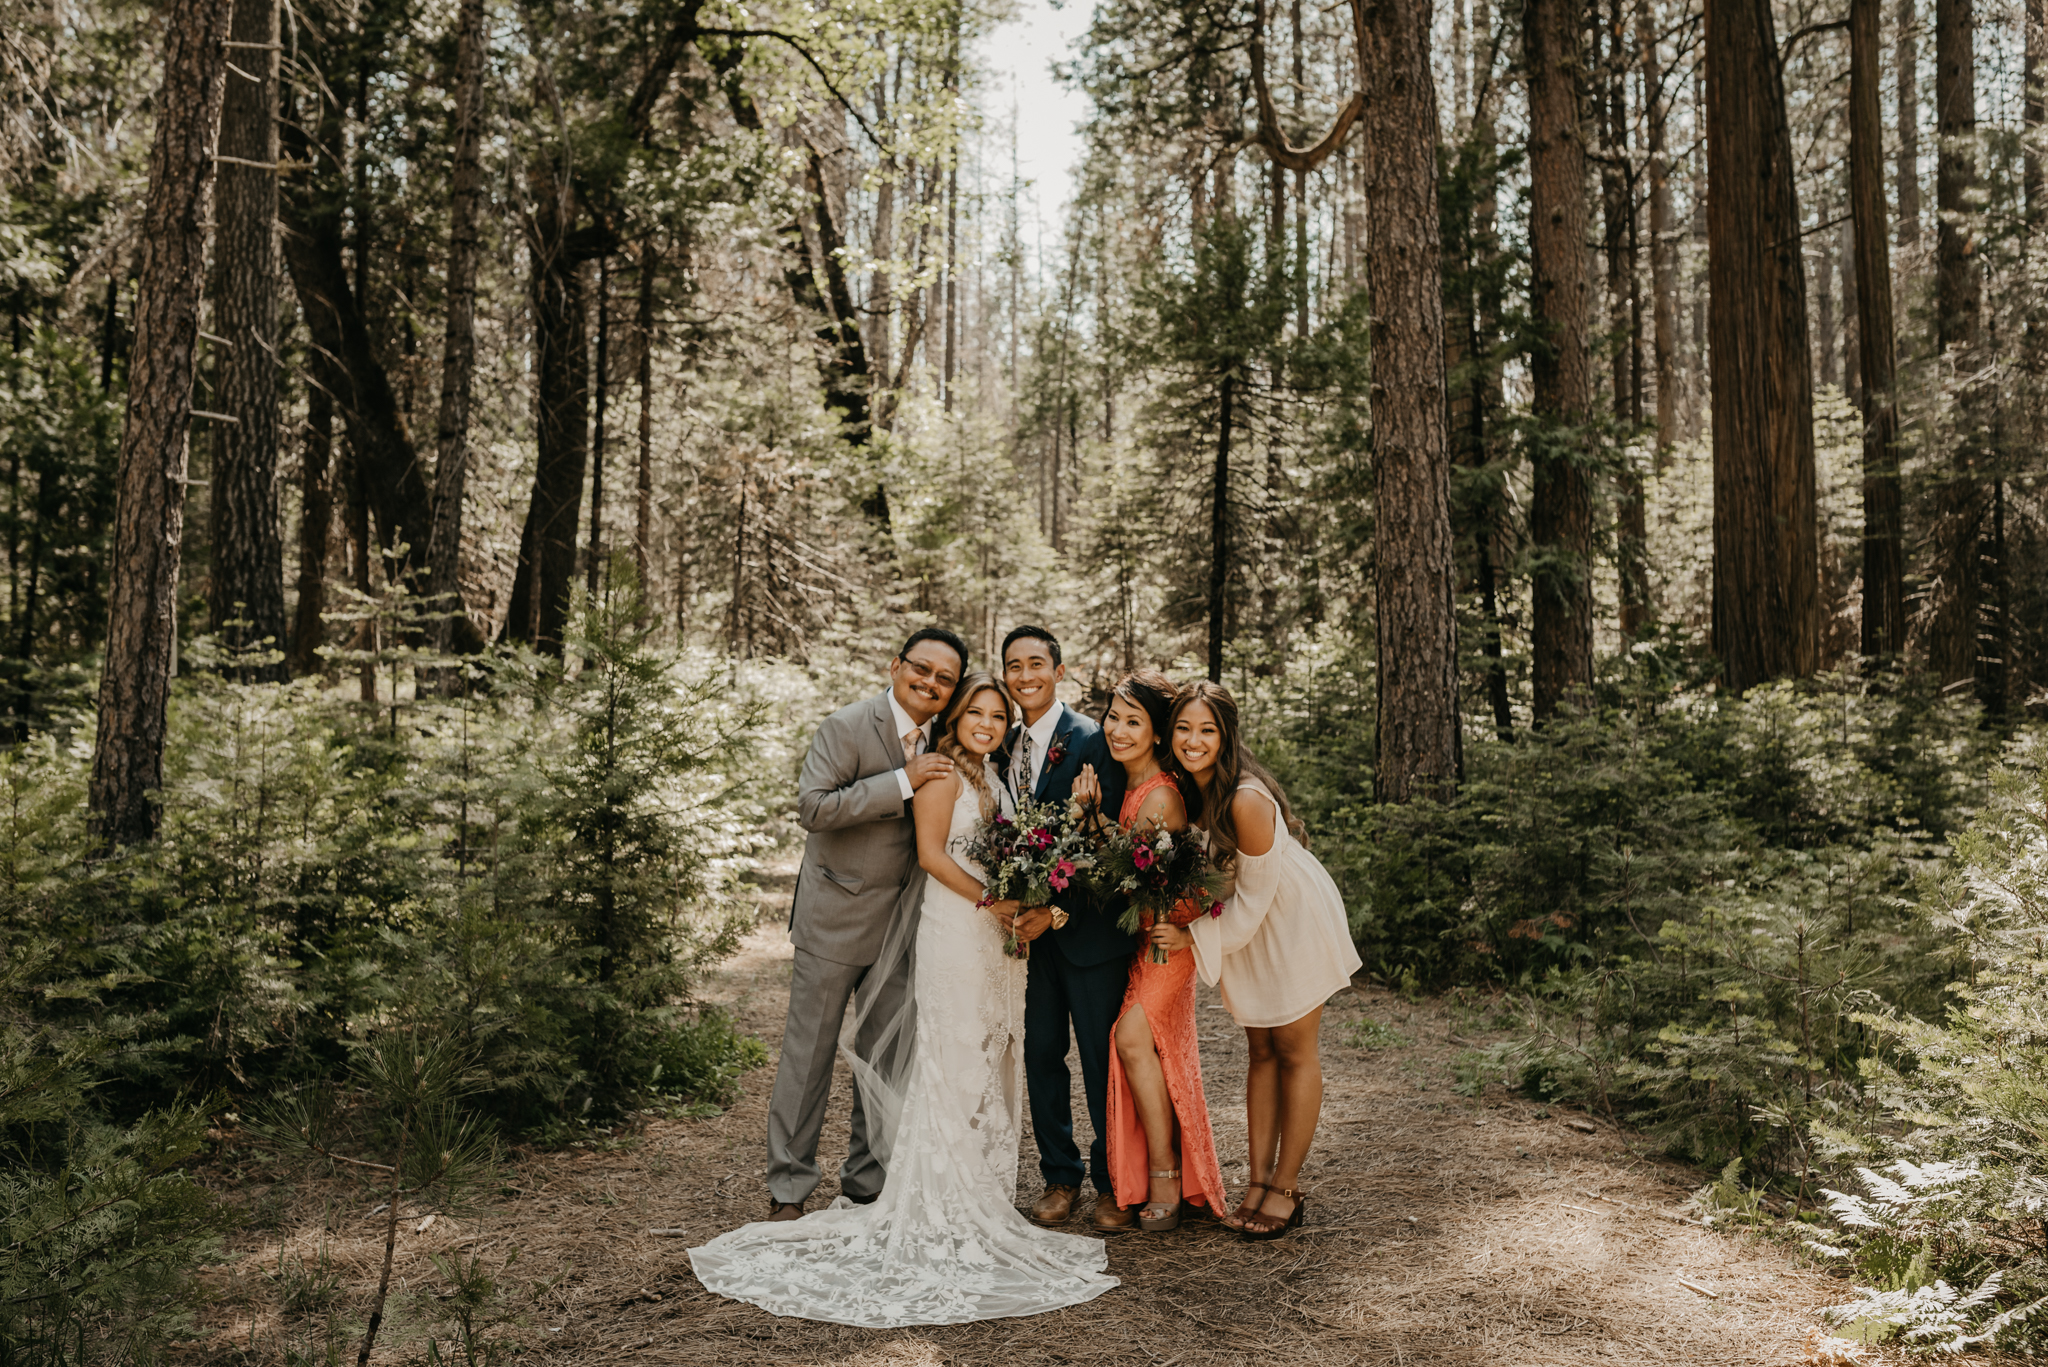 © Isaiah + Taylor Photography - Evergreen Lodge Destination Yoesmite Wedding - Los Angeles Wedding Photographer-125.jpg